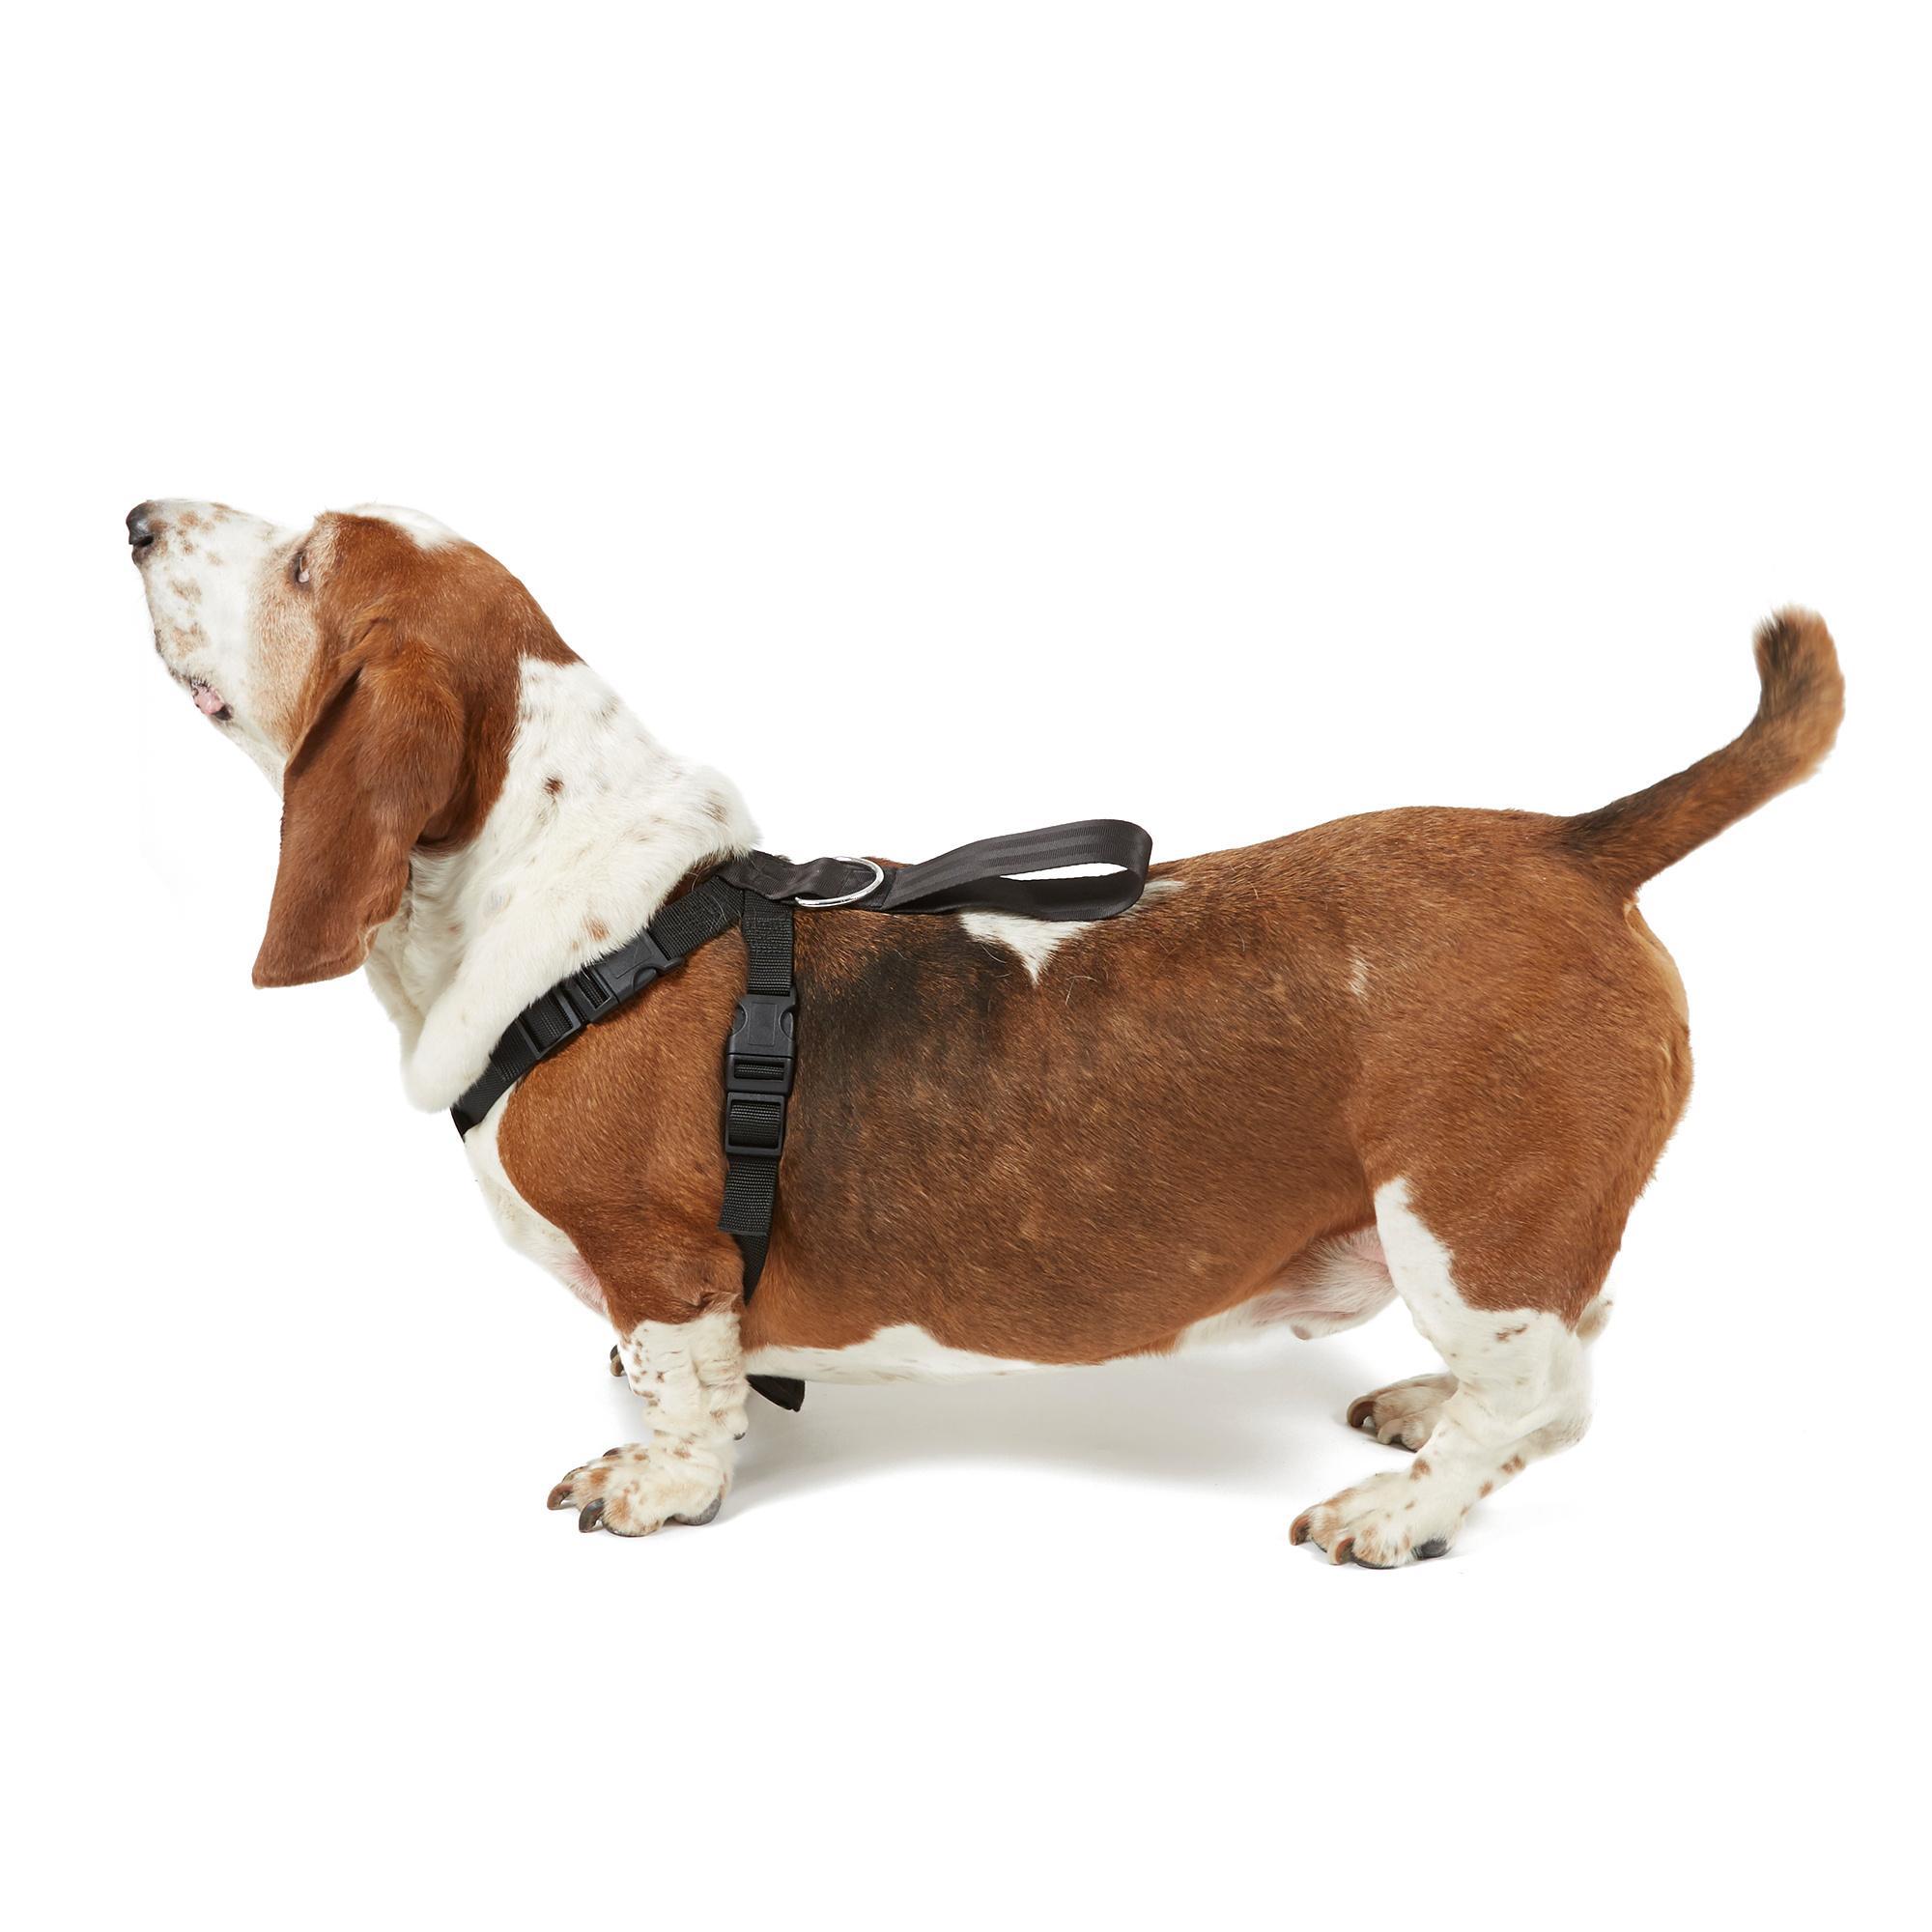 Image of Boyz Toys Dog Harness - Small, Black